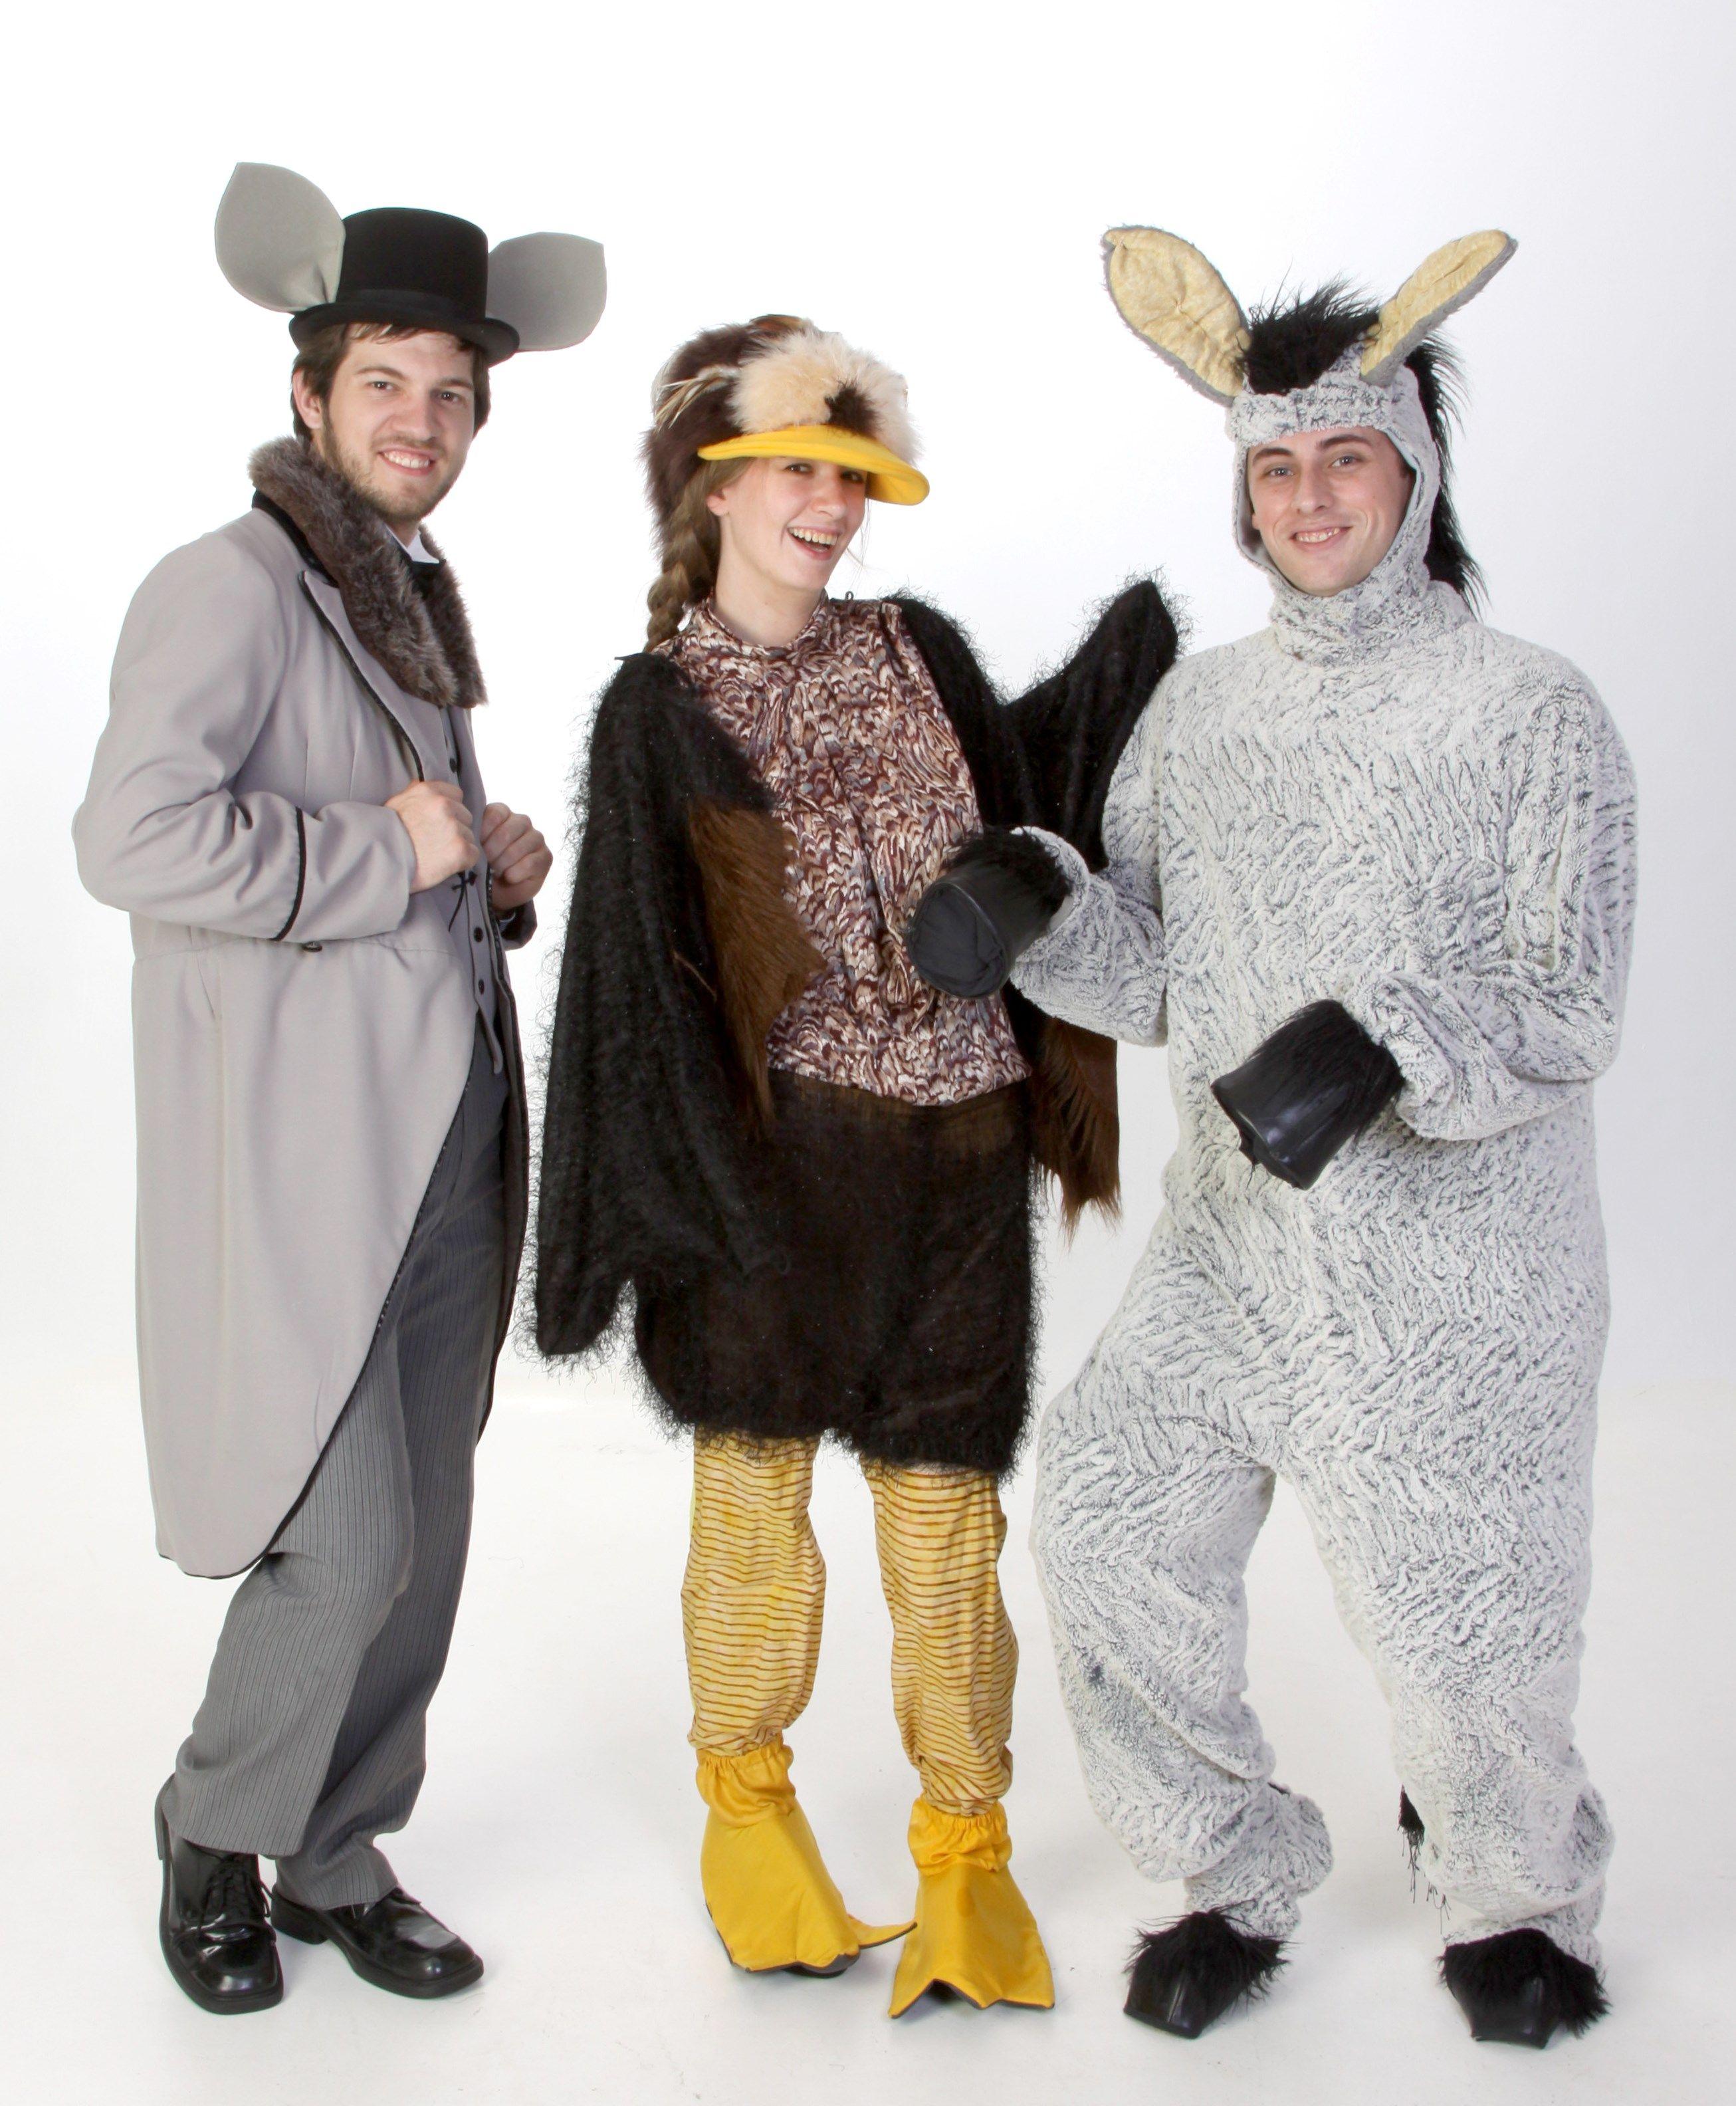 Tap-Dancing Rat Ugly Duckling Donkey Costumes - Shrek Rental from $39-  sc 1 st  Pinterest & Tap-Dancing Rat Ugly Duckling Donkey Costumes - Shrek Rental from ...